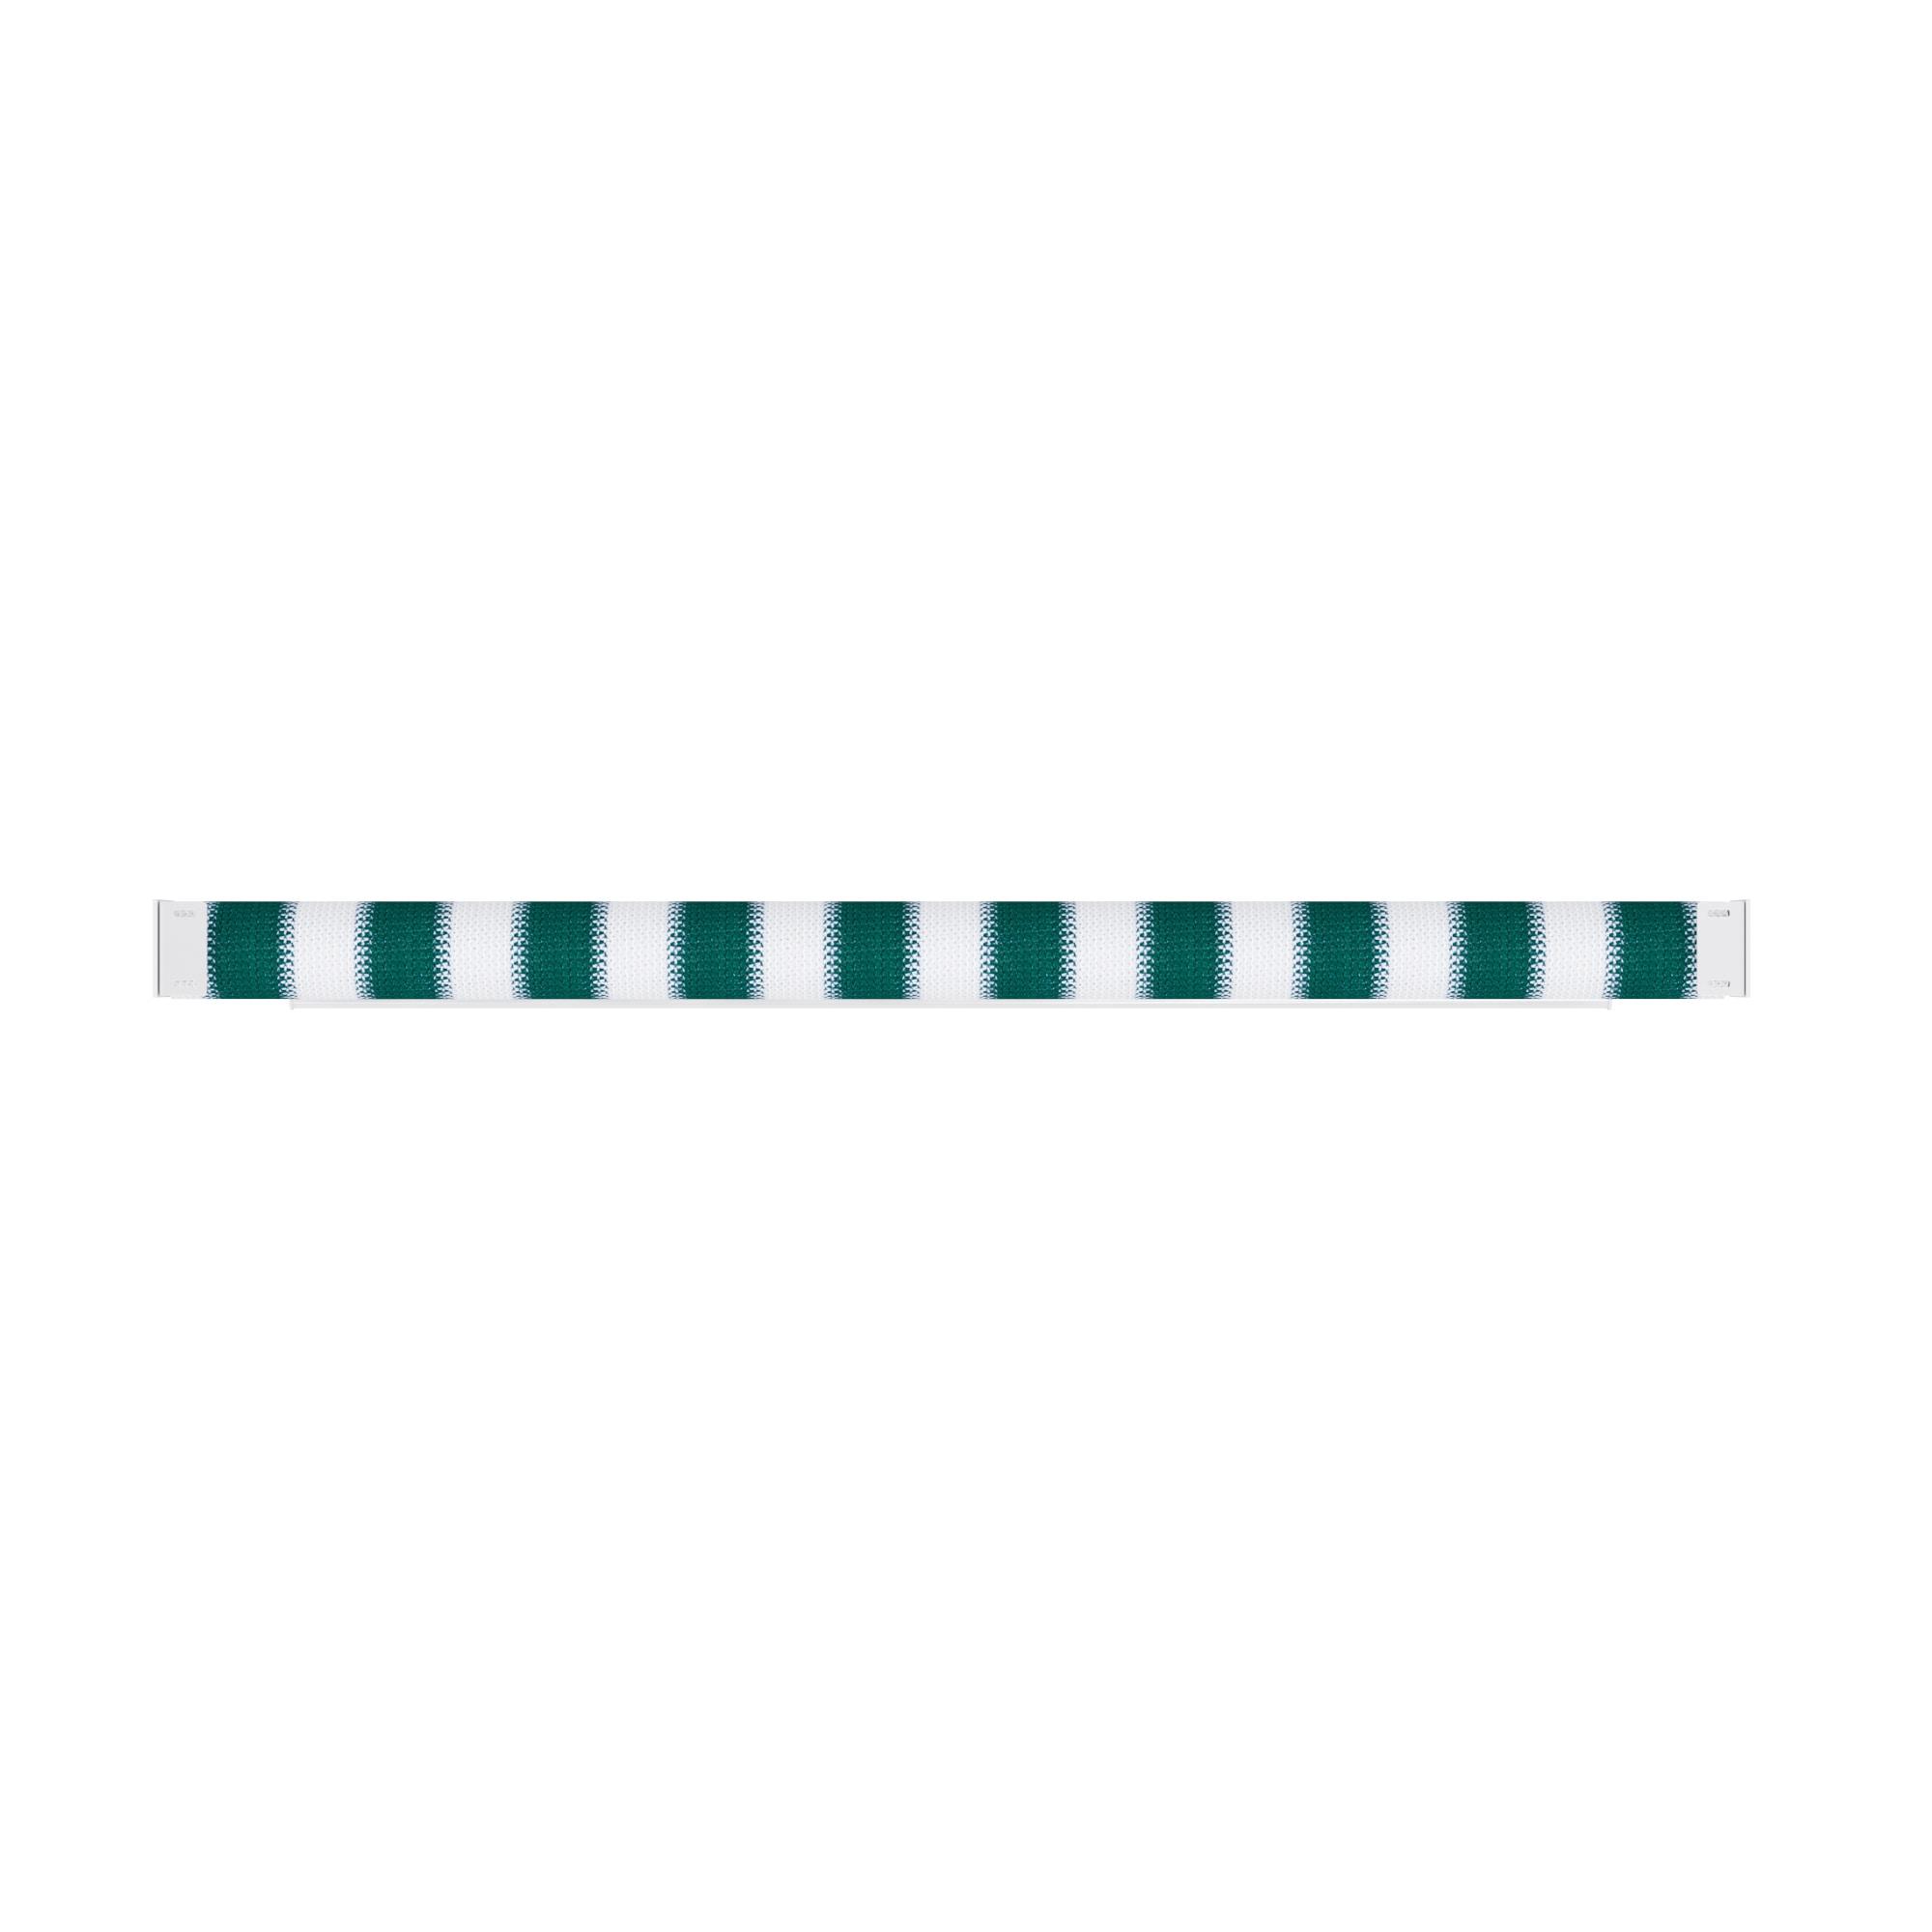 JAROLIFT-Senkrechtmarkise-Sichtschutz-Aussenrollo-Sonnenschutz-Aussen-Rollo-Balkon Indexbild 30